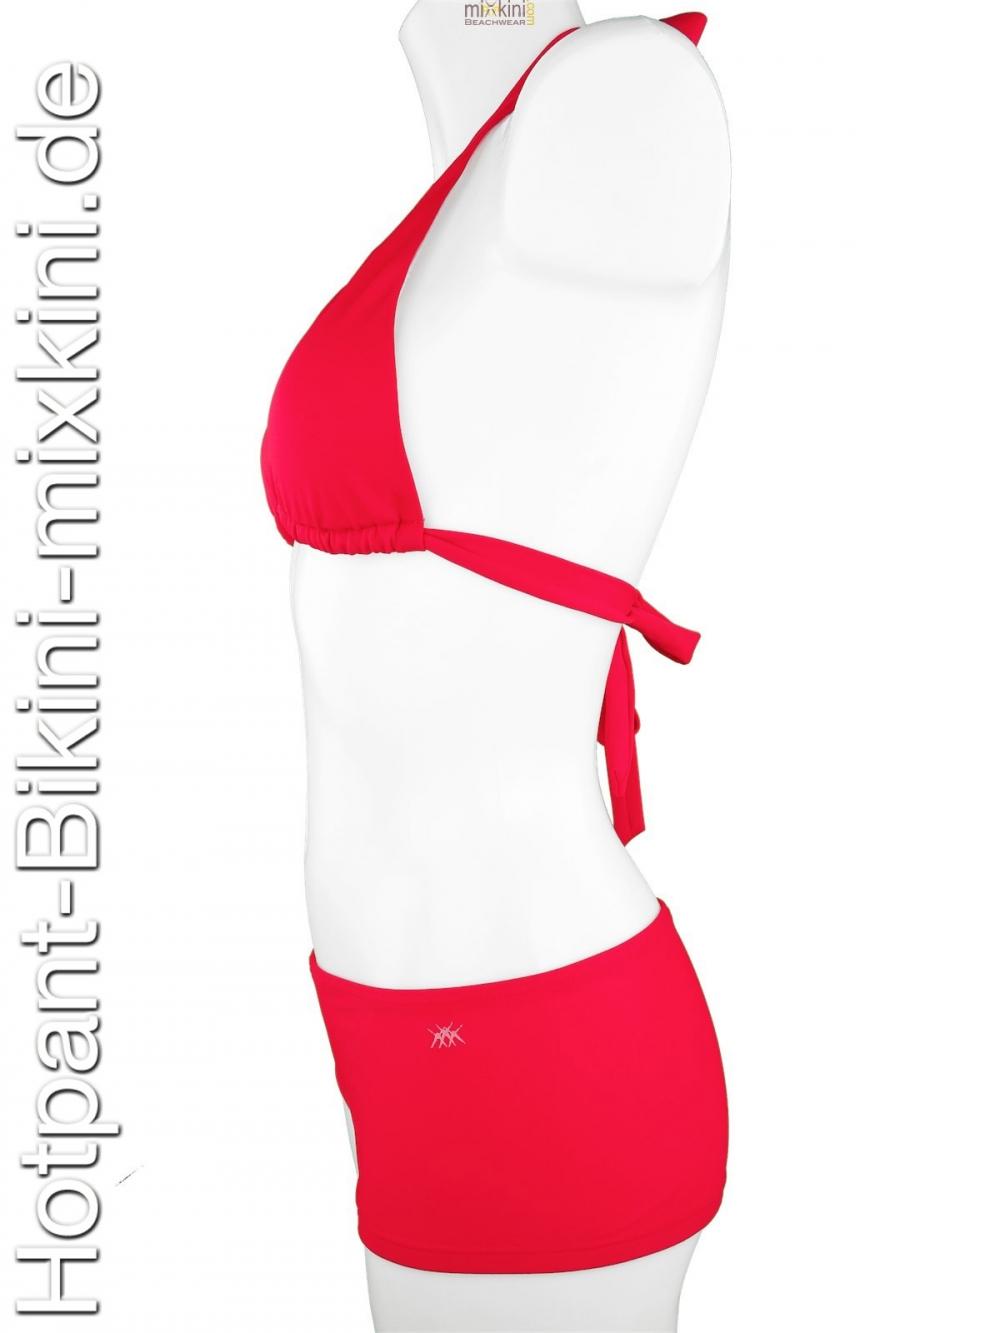 schicke rote bikini hotpant sets zum preisvorteil. Black Bedroom Furniture Sets. Home Design Ideas